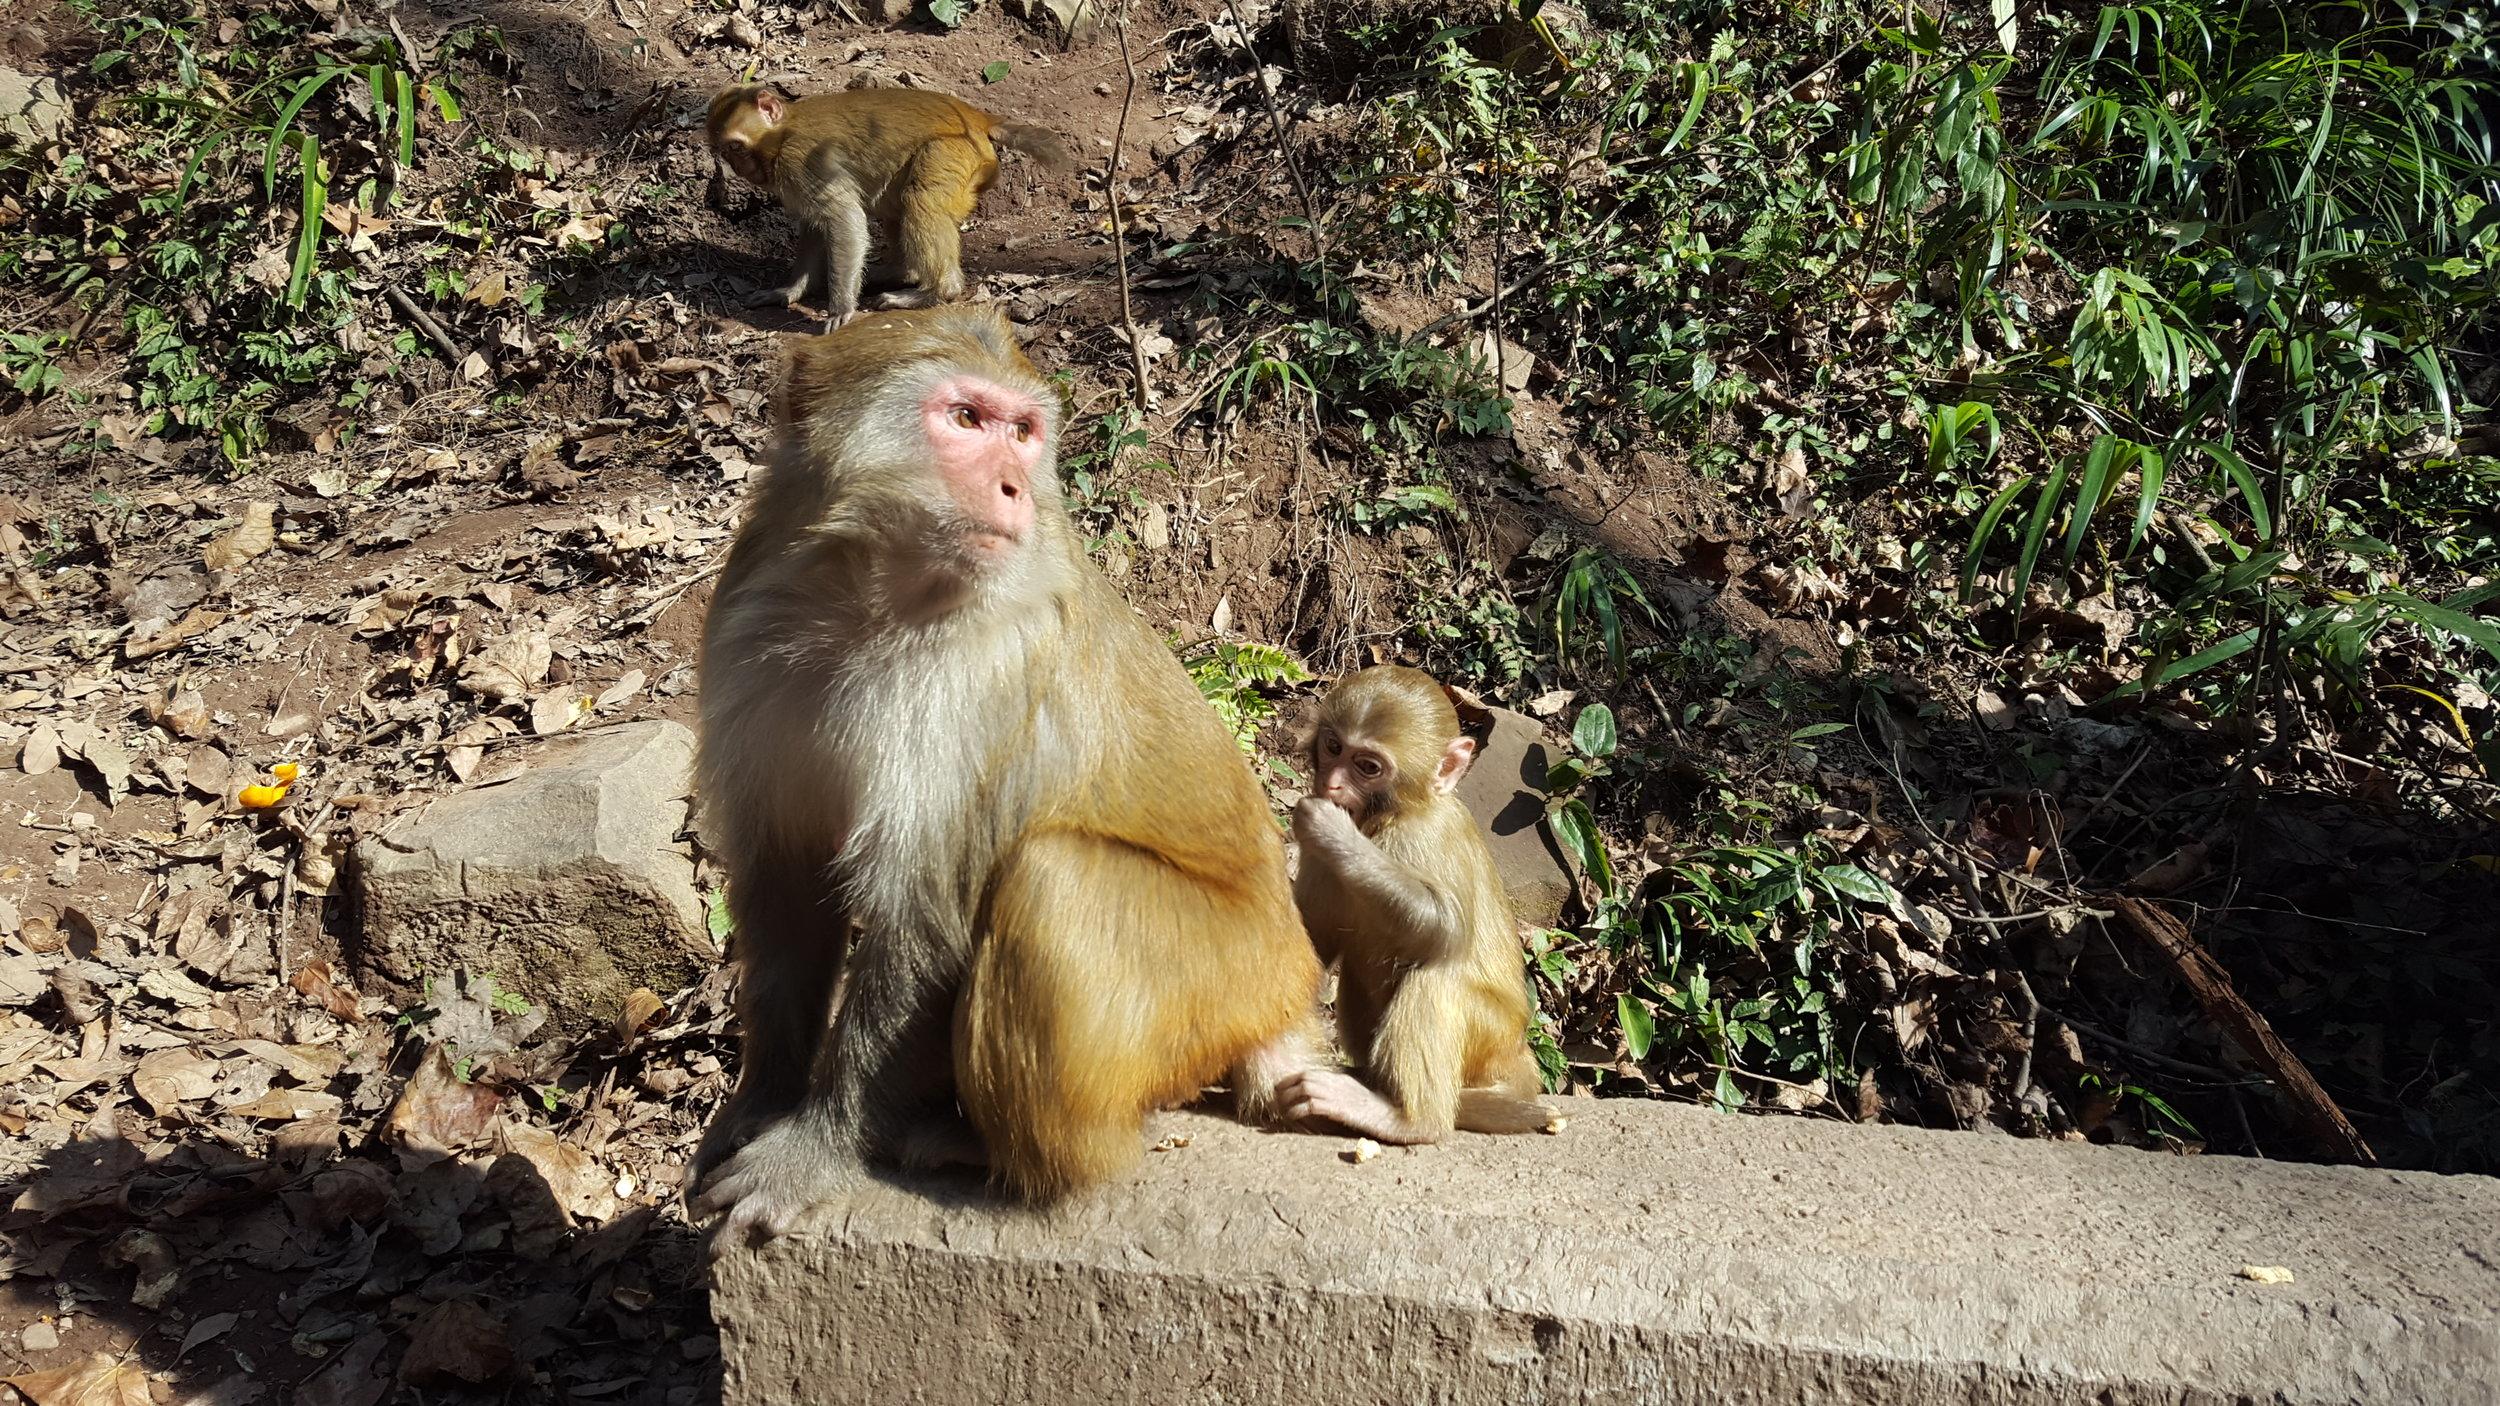 A baby monkey and its mamma in Zhangjiajie, China